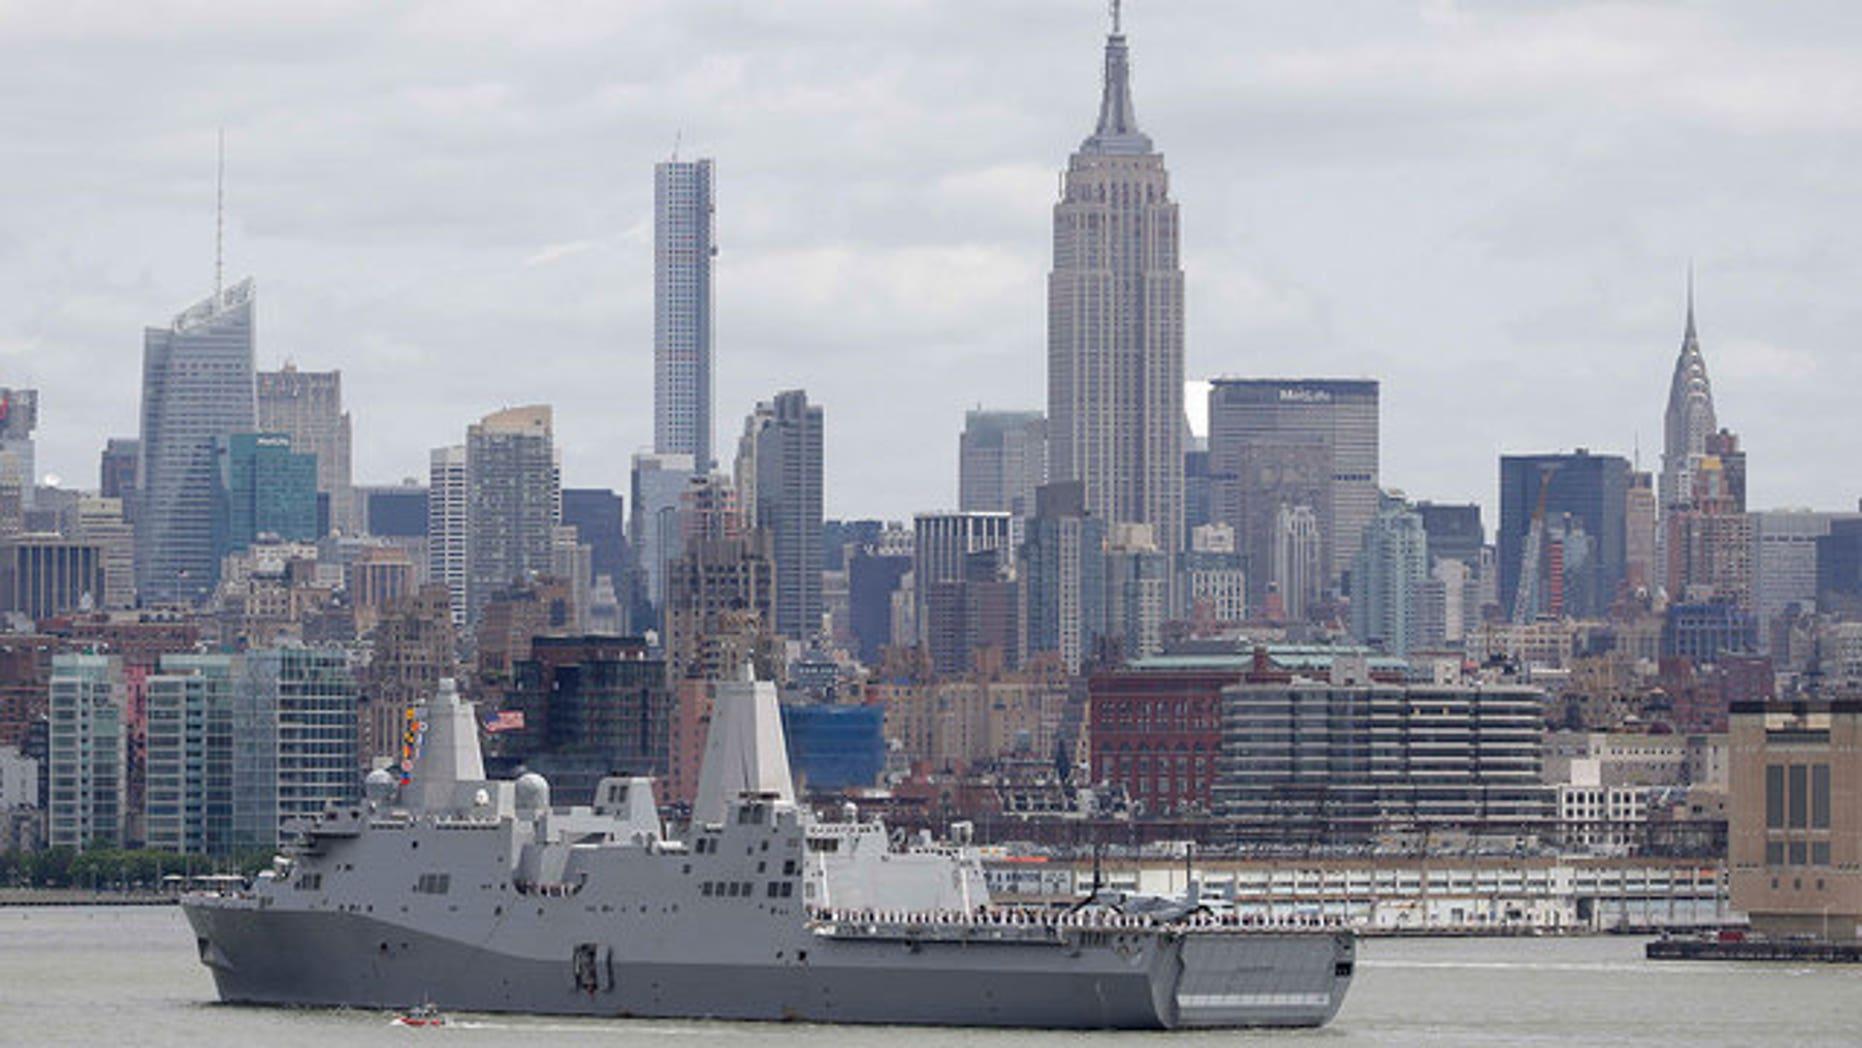 A U.S. Navy ship arrives in New York Harbor to mark the start of Fleet Week.